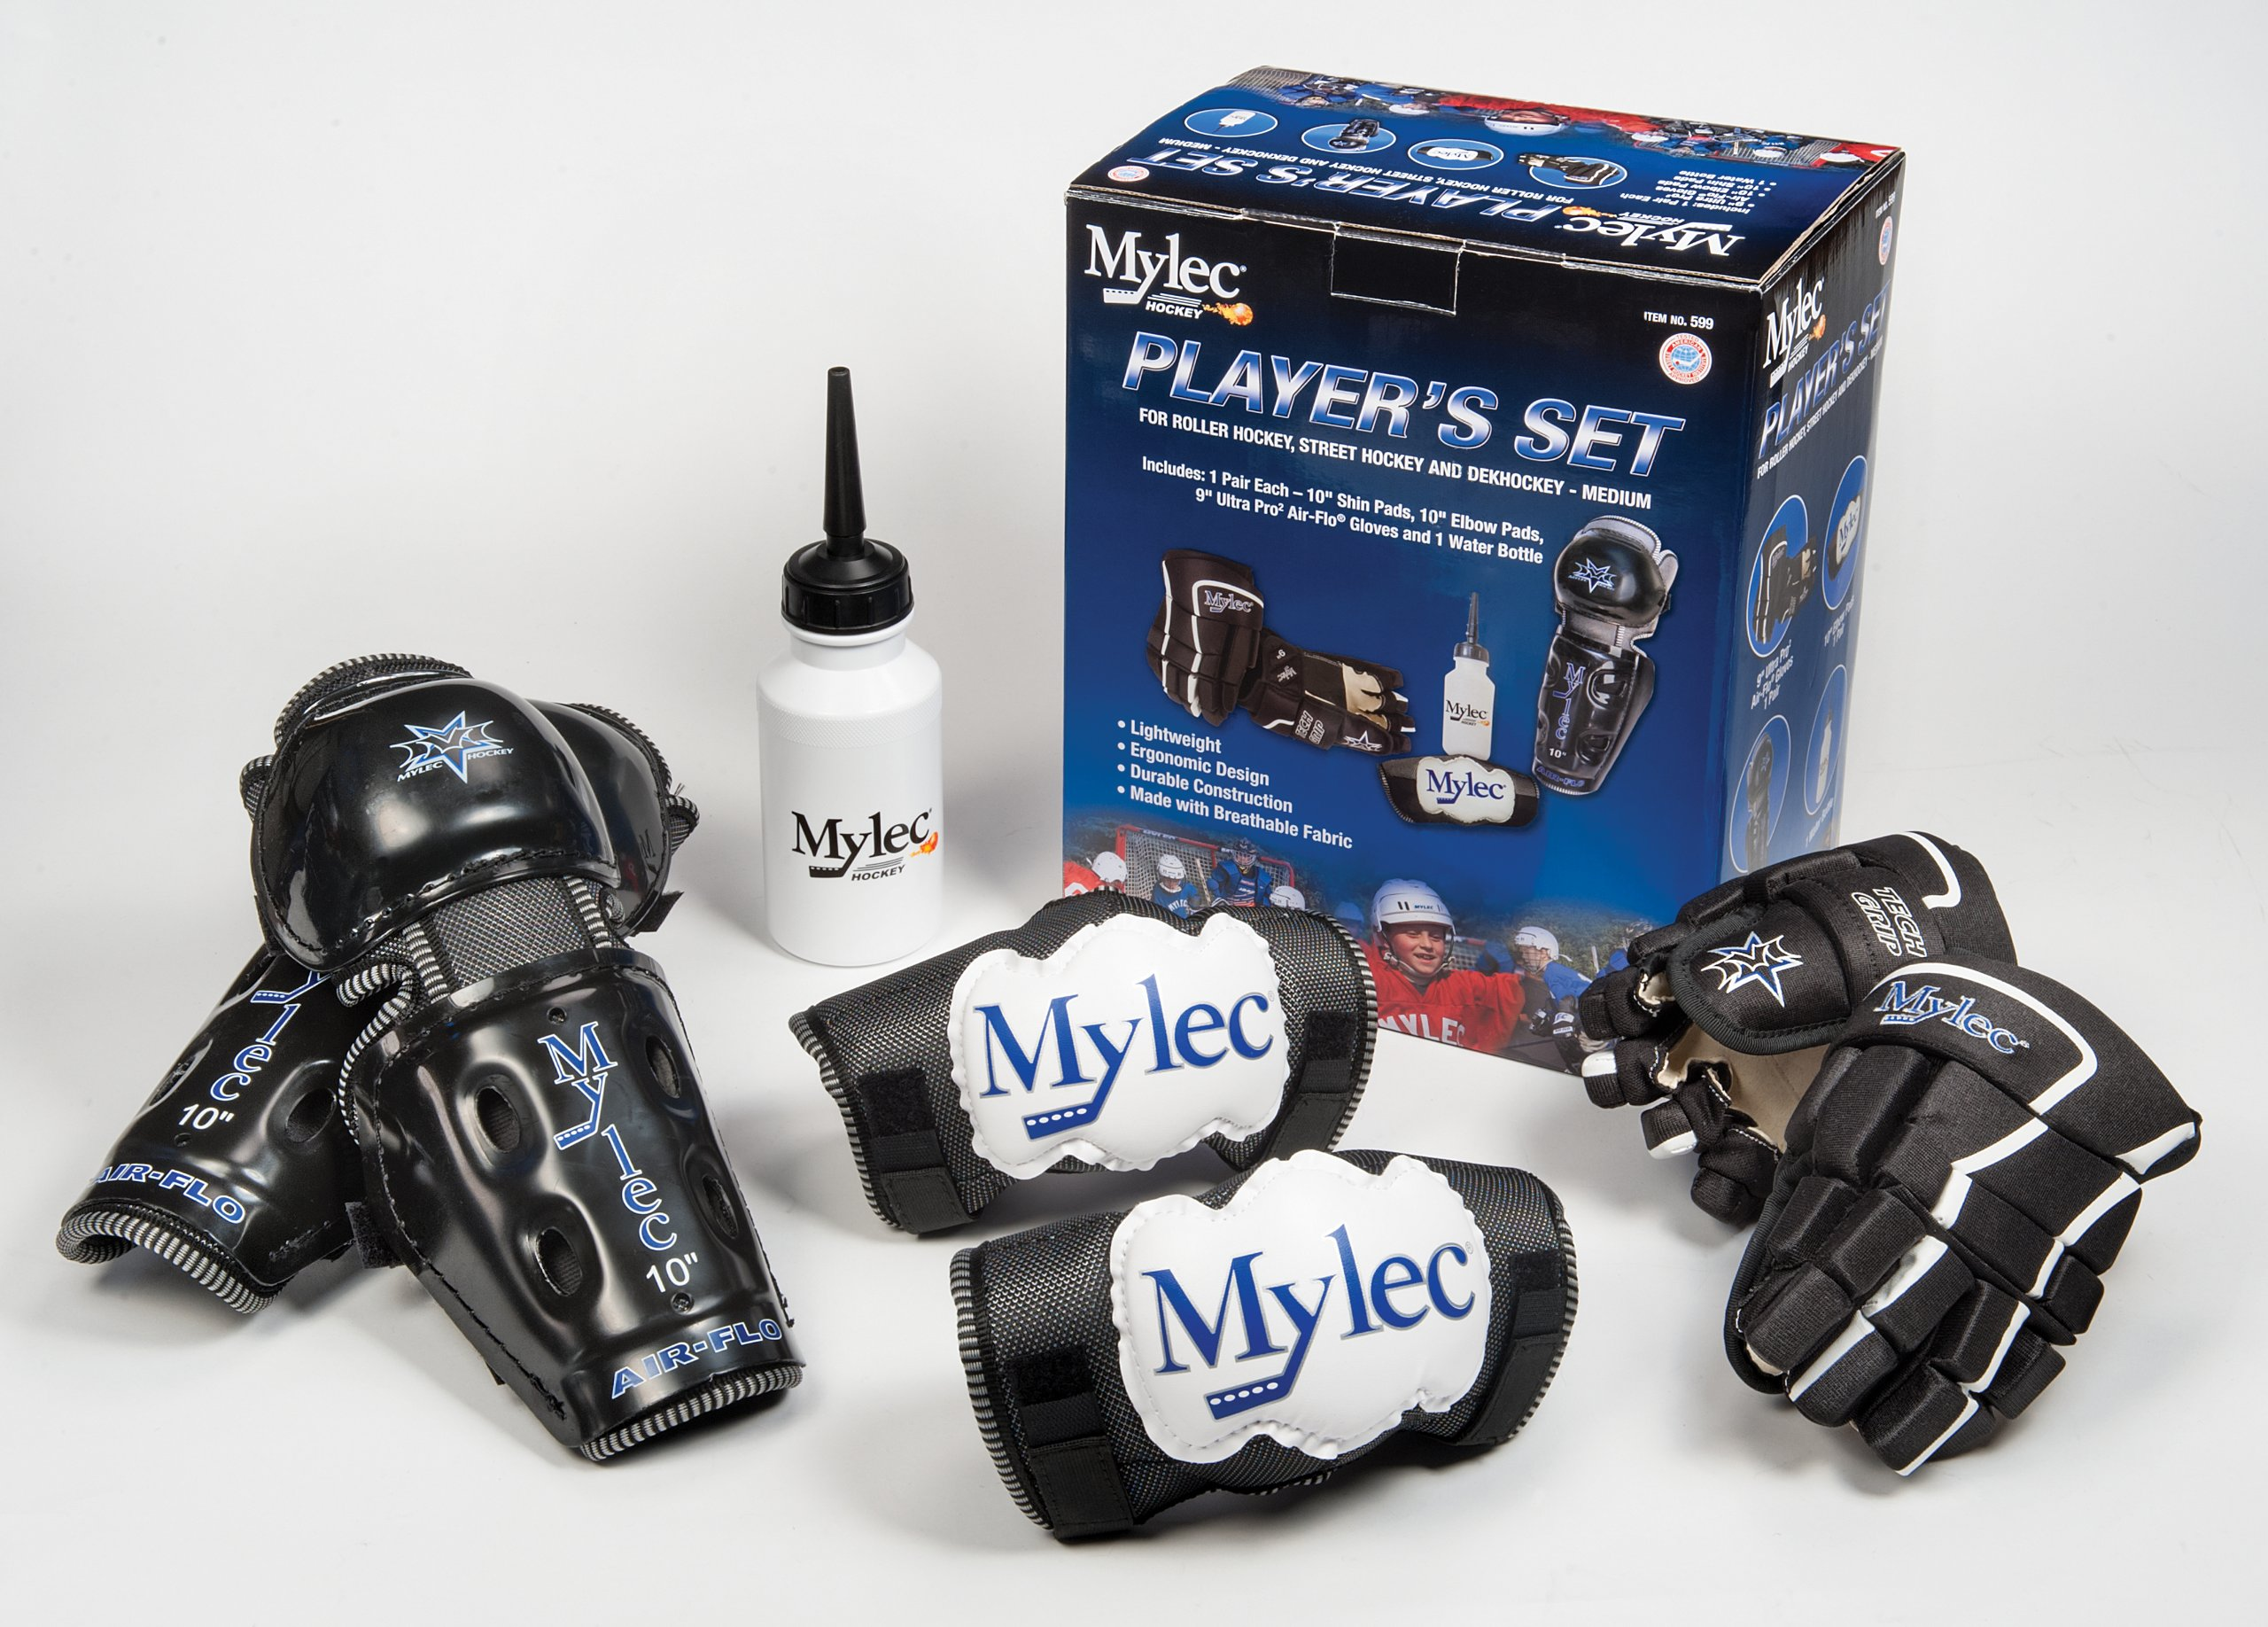 Mylec Player's Set, Black/White/Blue, Medium